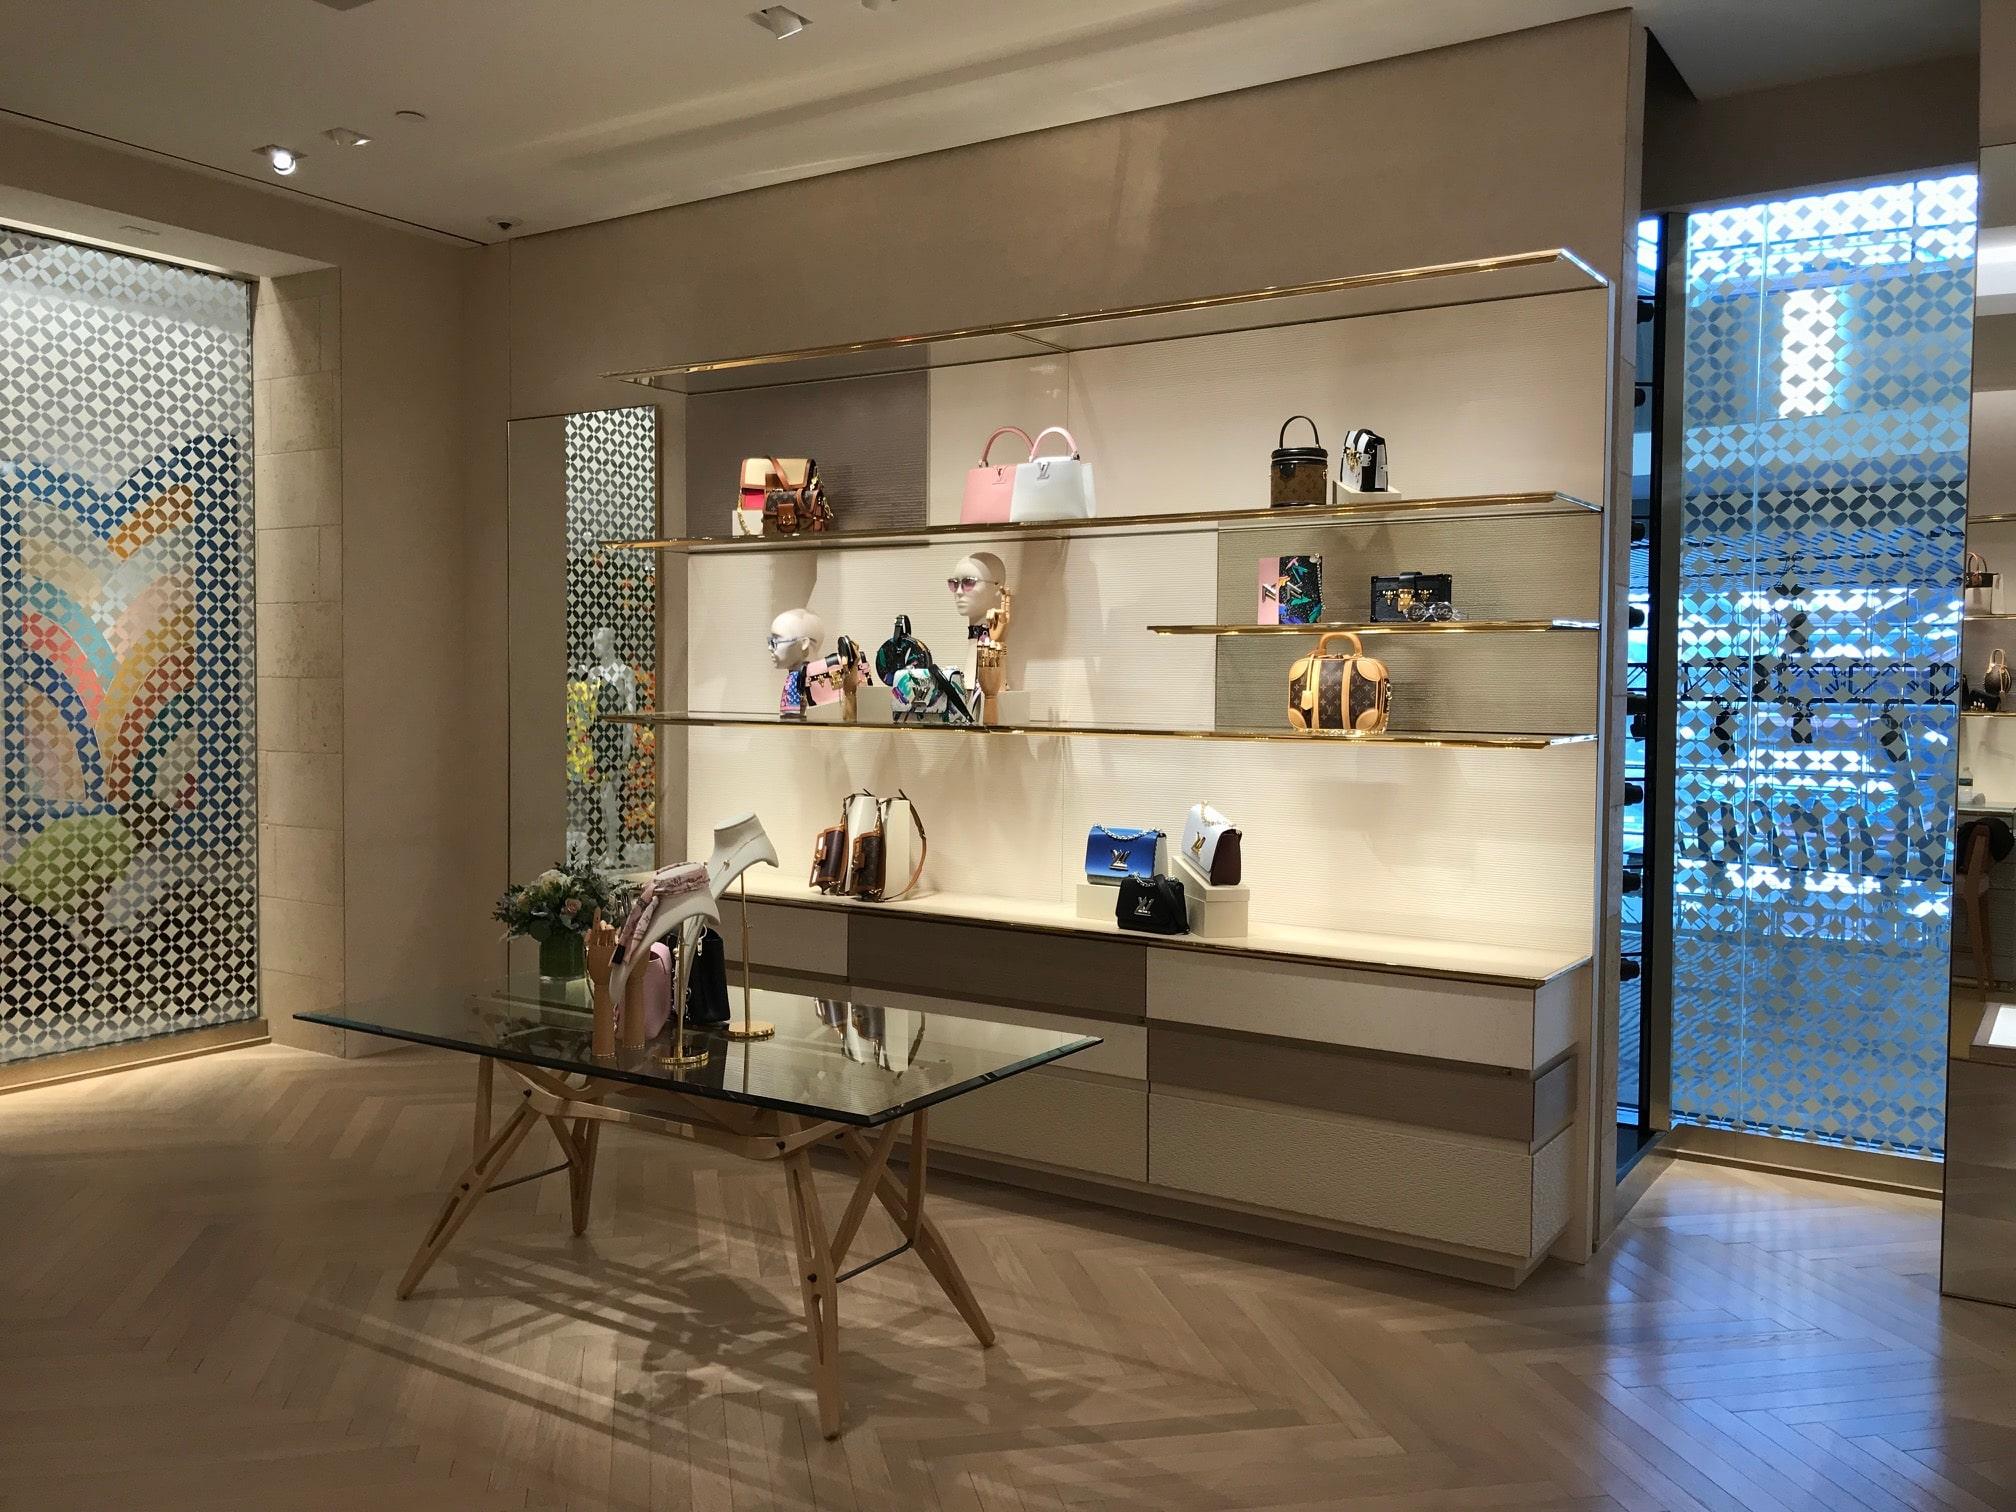 Perimeter Millwork at Louis Vuitton